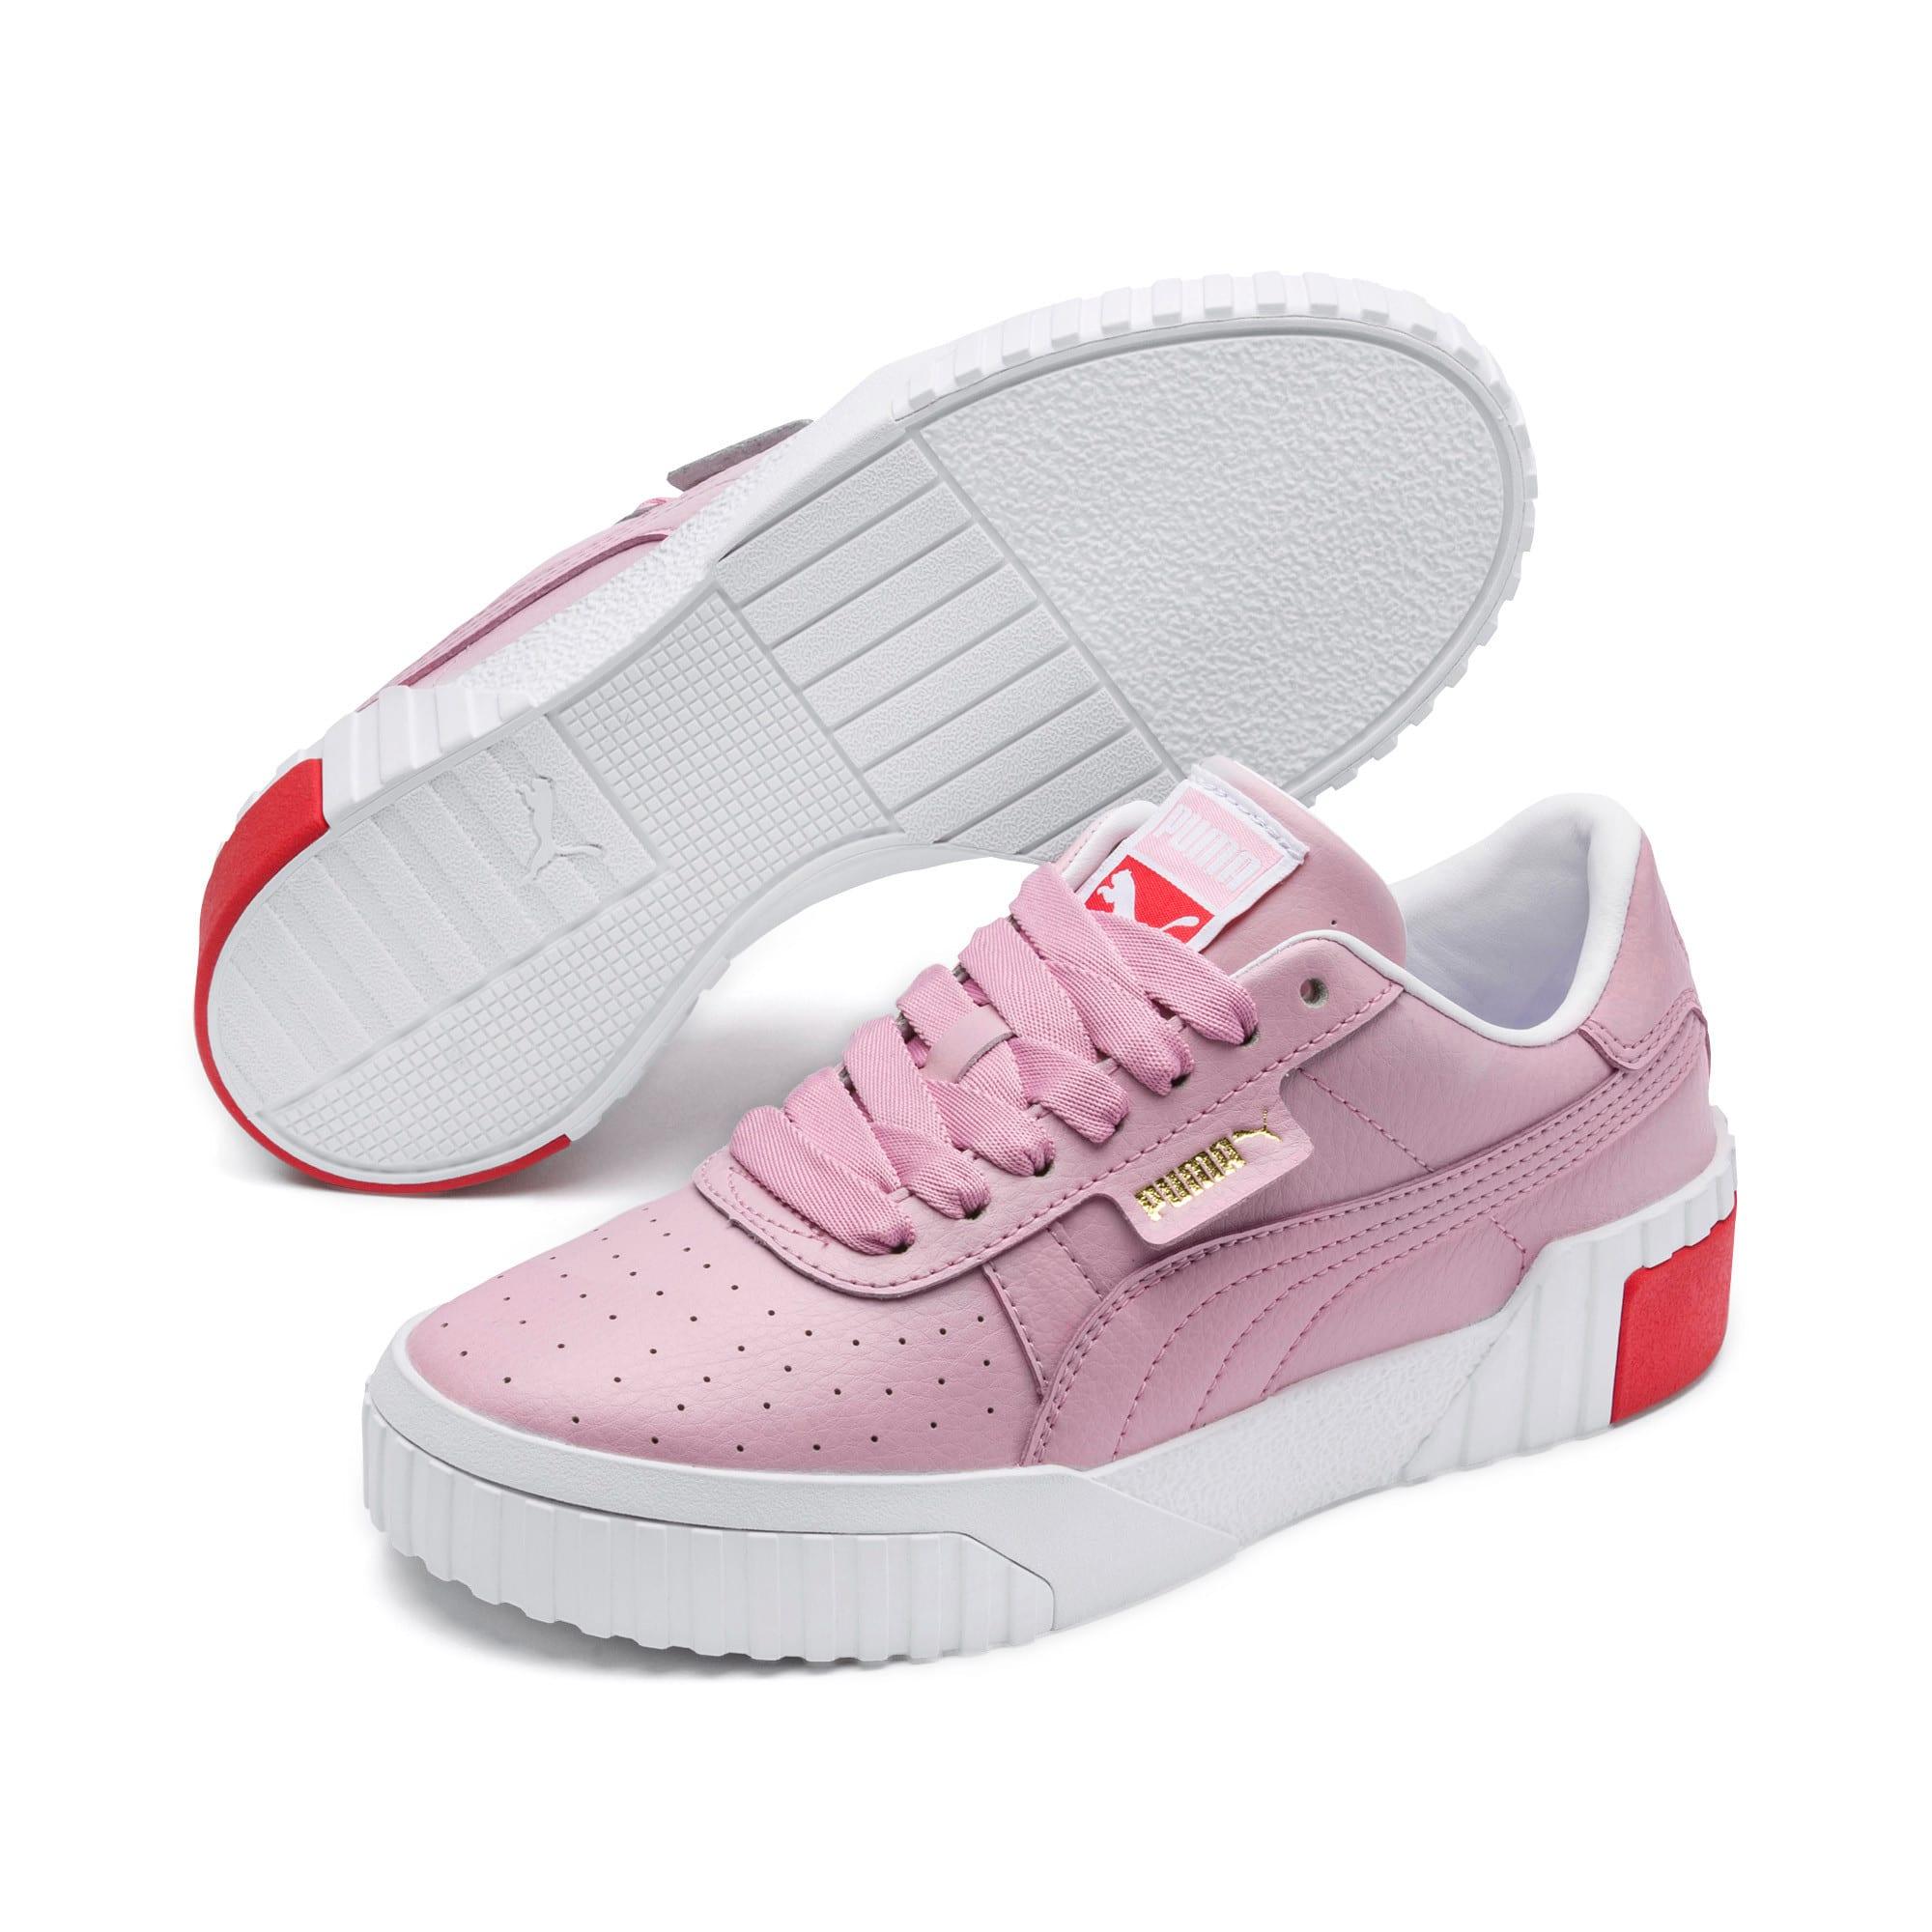 Thumbnail 2 of Cali sneakers voor meisjes, Puma White-Hibiscus, medium